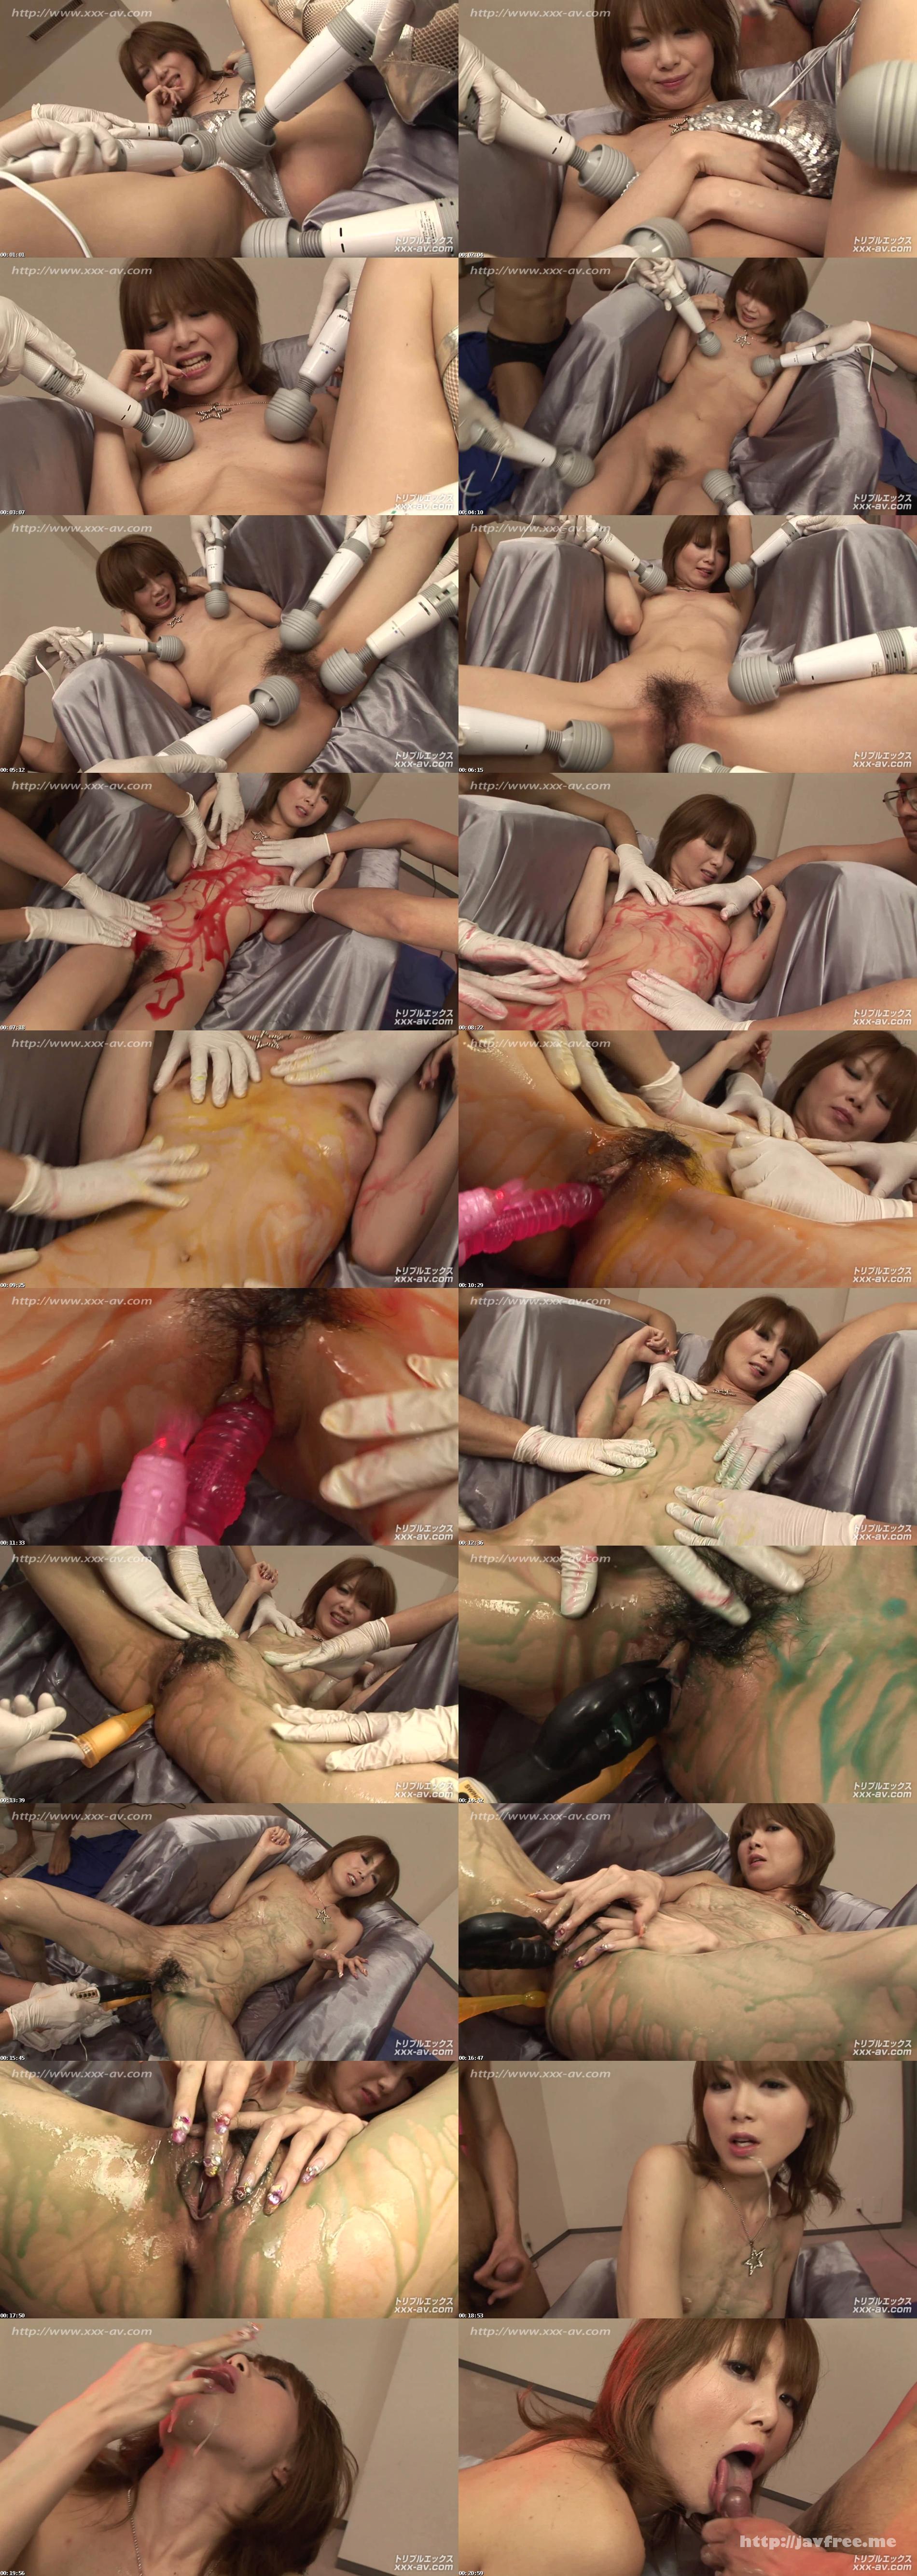 XXX AV 21718 やめられない・・・SEX依存性PART3フルHD~盛り狂う淫らな女達~桜井梨花 特典映像編 XXX AV